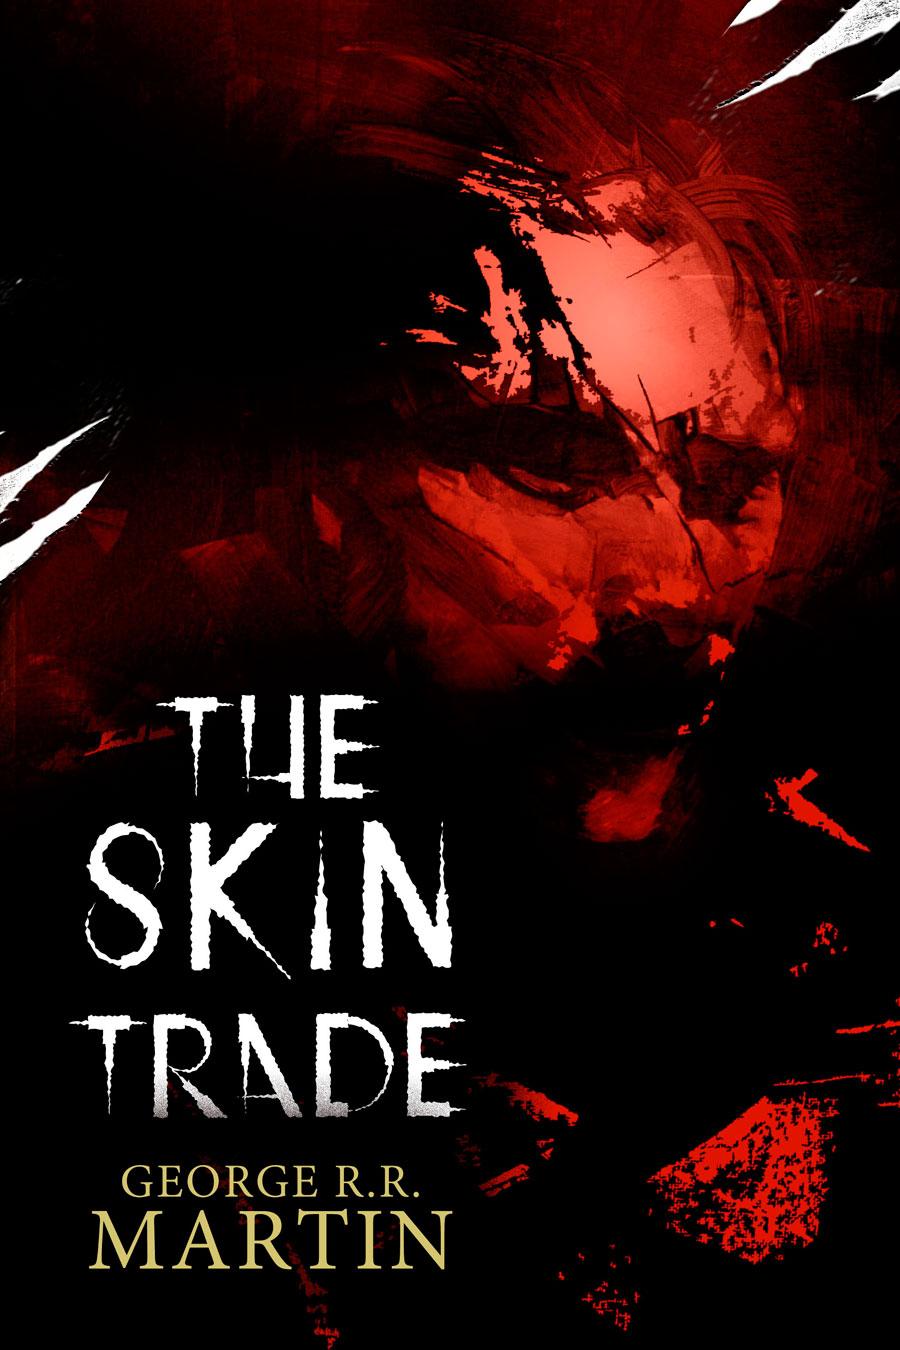 The-Skin-Trade---George-R.R.-Martin